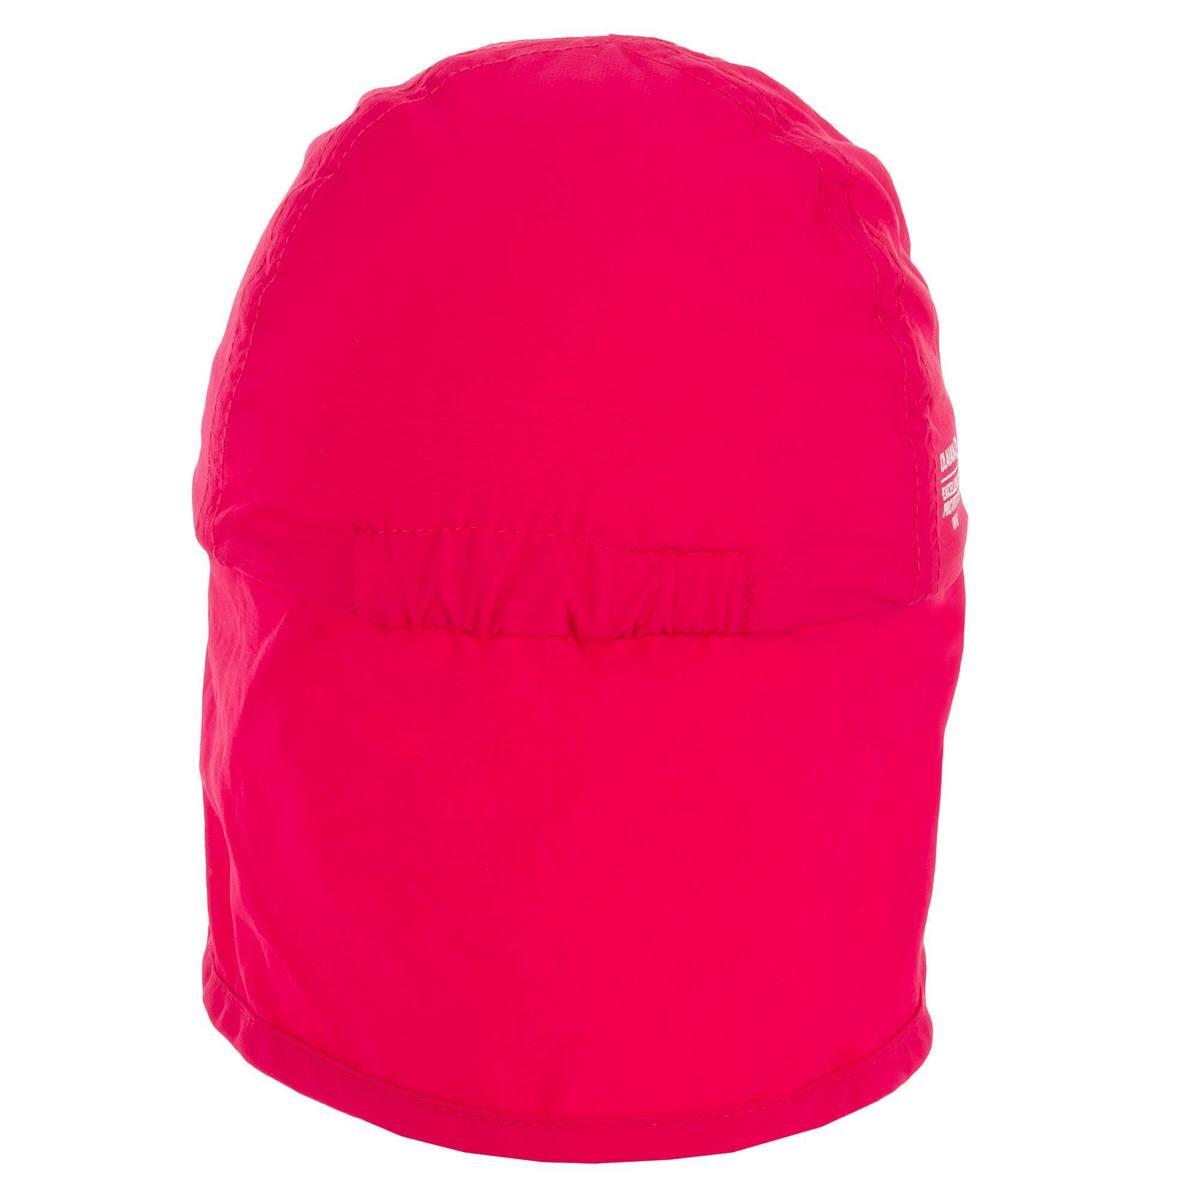 Bild 3 von UV-Cap Baby rosa